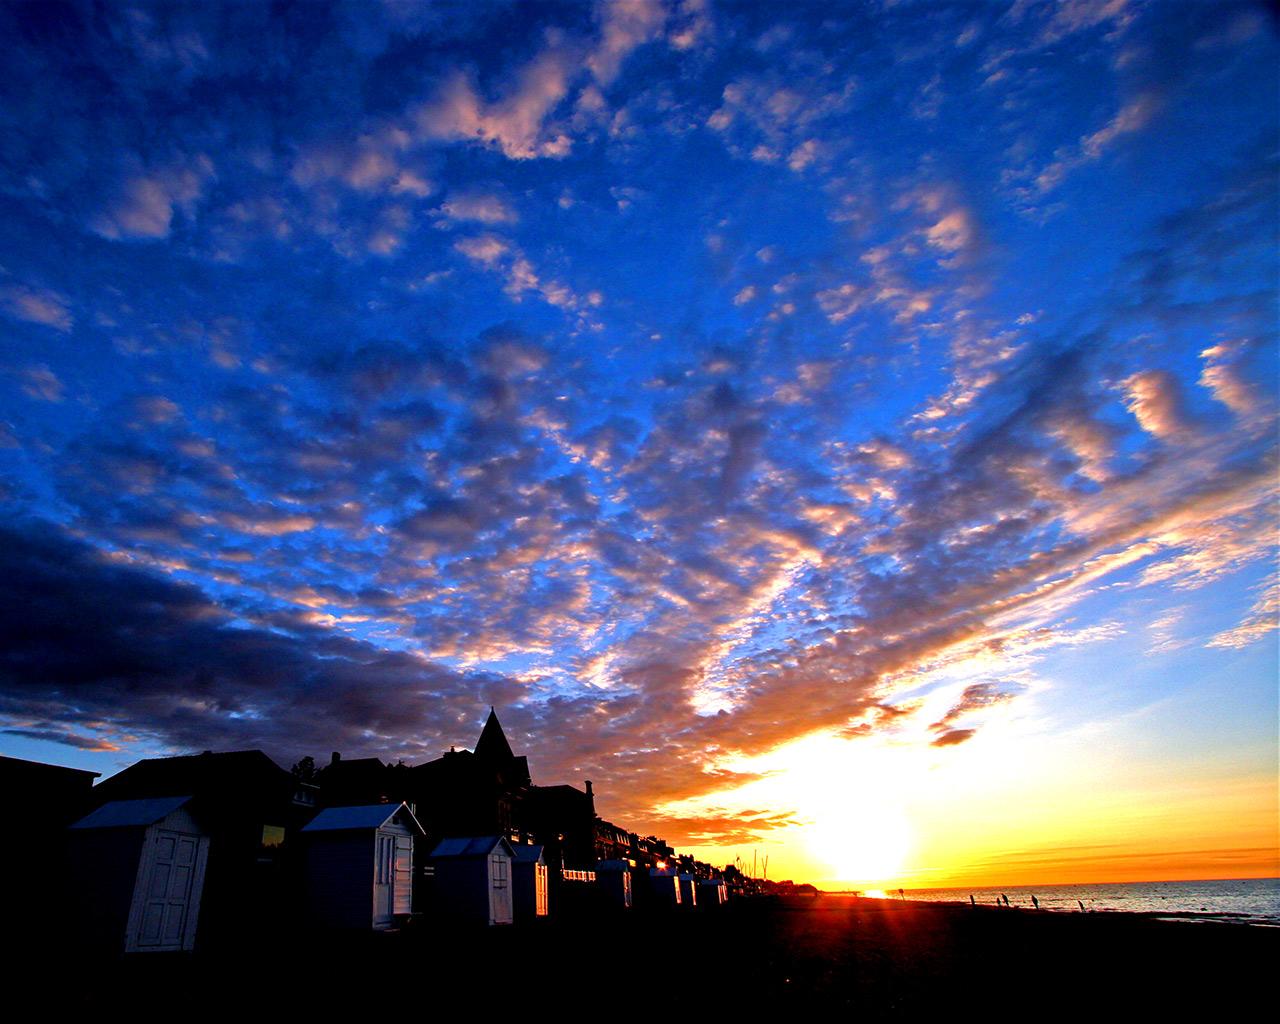 http://2.bp.blogspot.com/-N1p4qd8dvAw/Tbys4dPmesI/AAAAAAAACbs/sZOXFlI06ew/s1600/landscape1280x1024.jpg